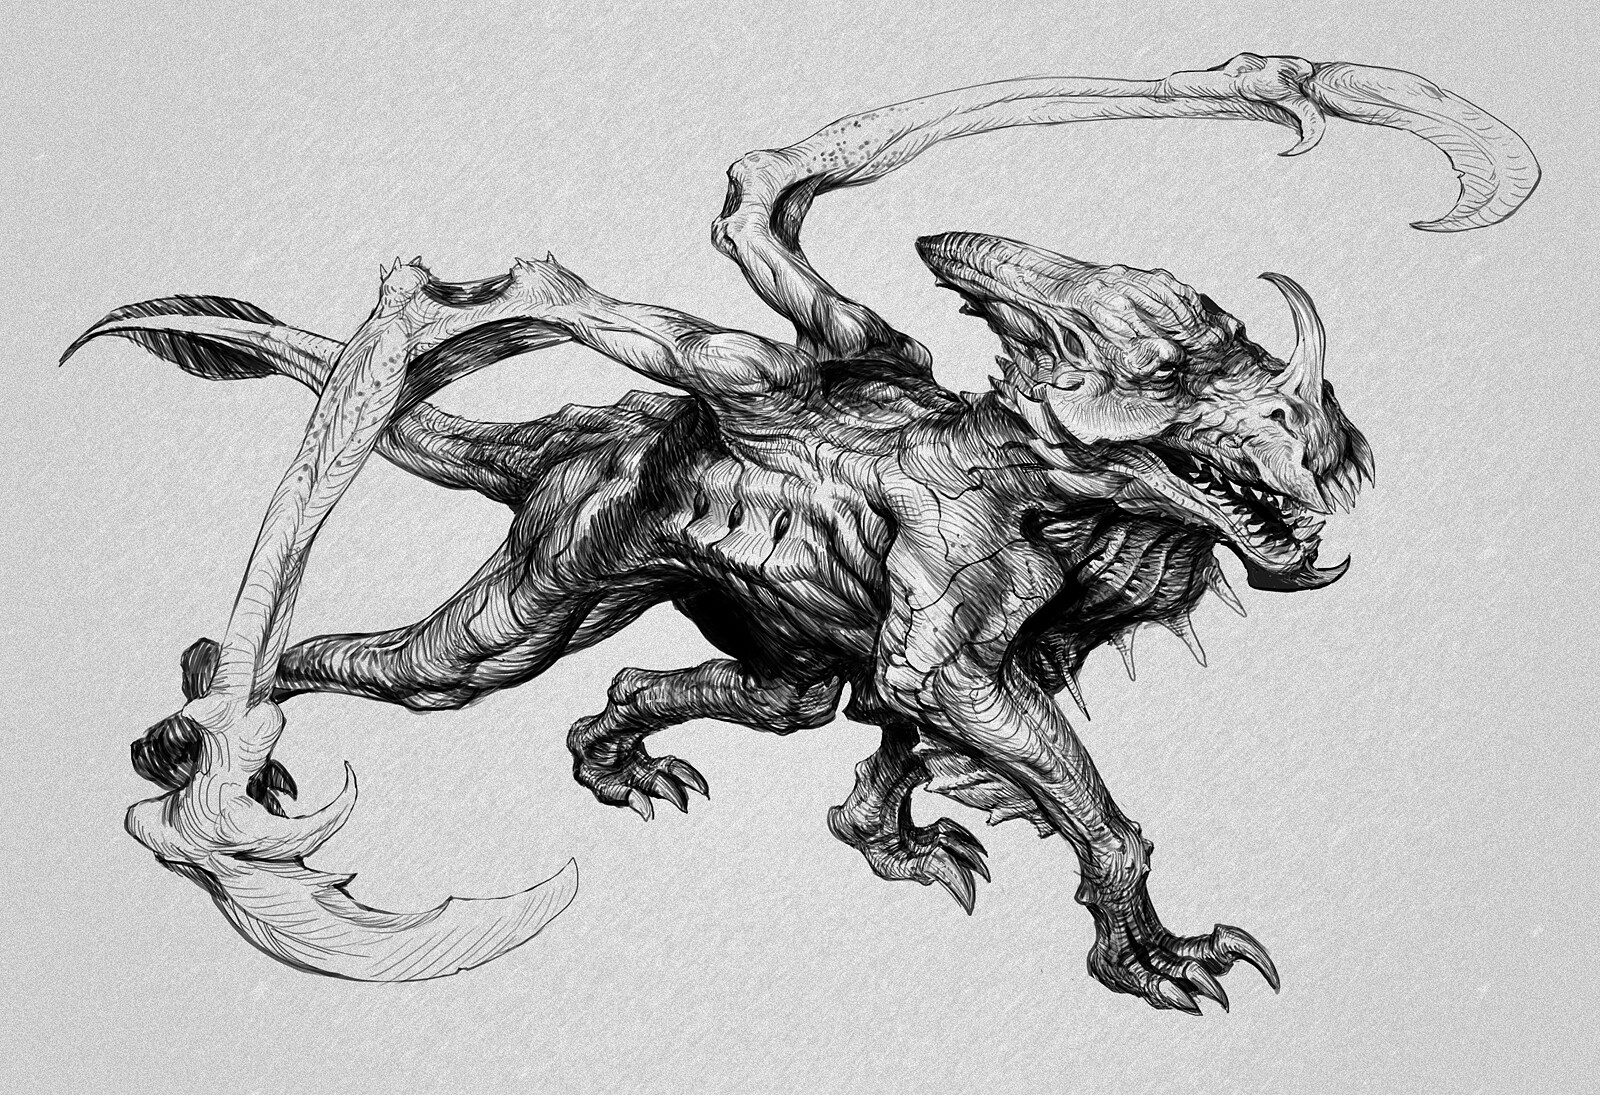 Miro petrov creature 01